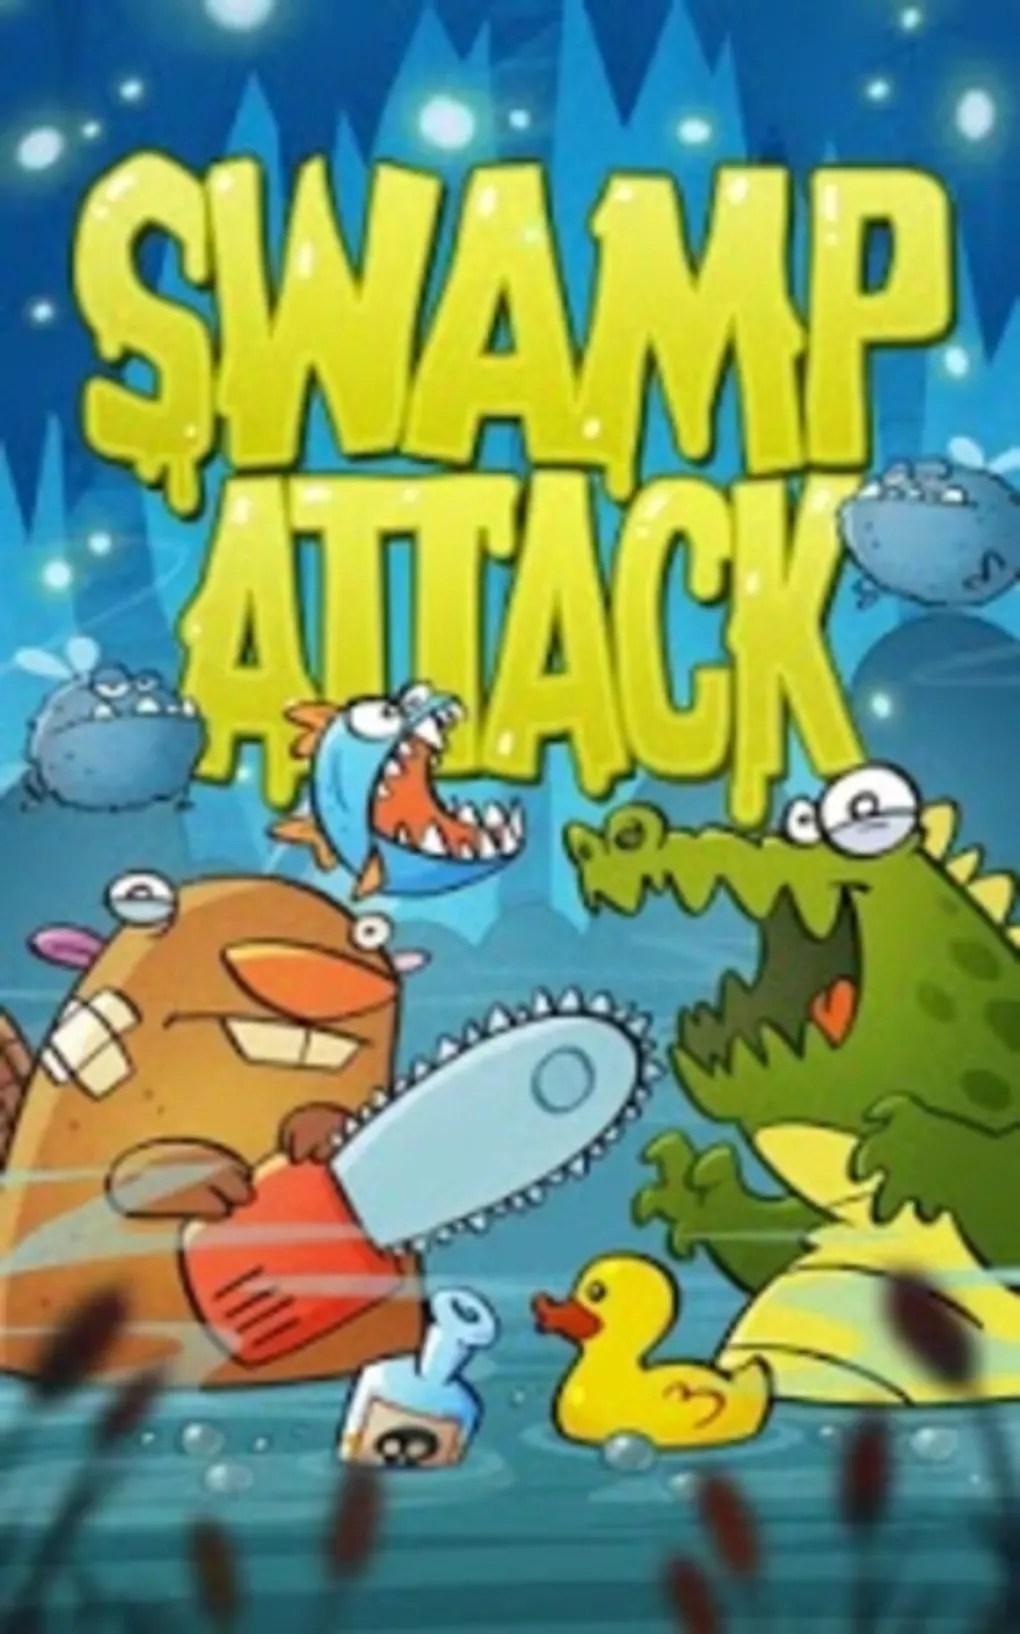 Download Swamp Attack Mod Apk : download, swamp, attack, Swamp, Attack, Android, Download